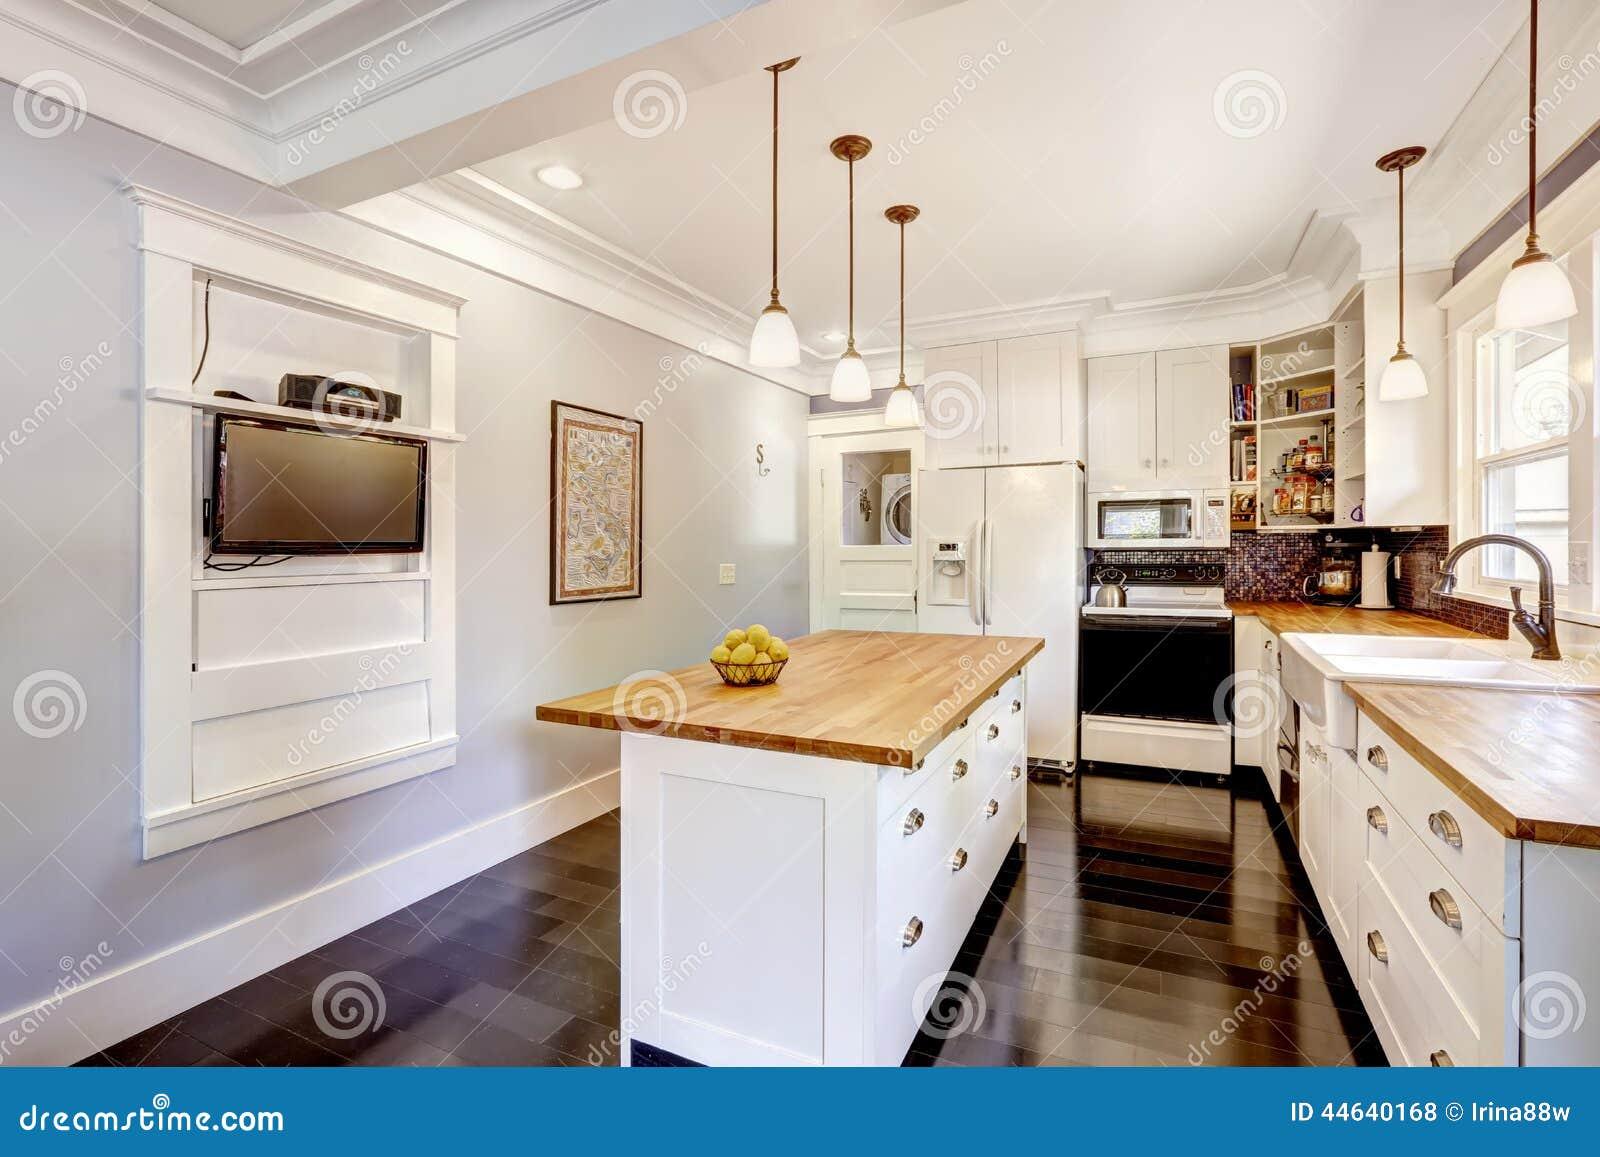 Witte keukenkast met witte toestellen Keukeneiland met houten ...